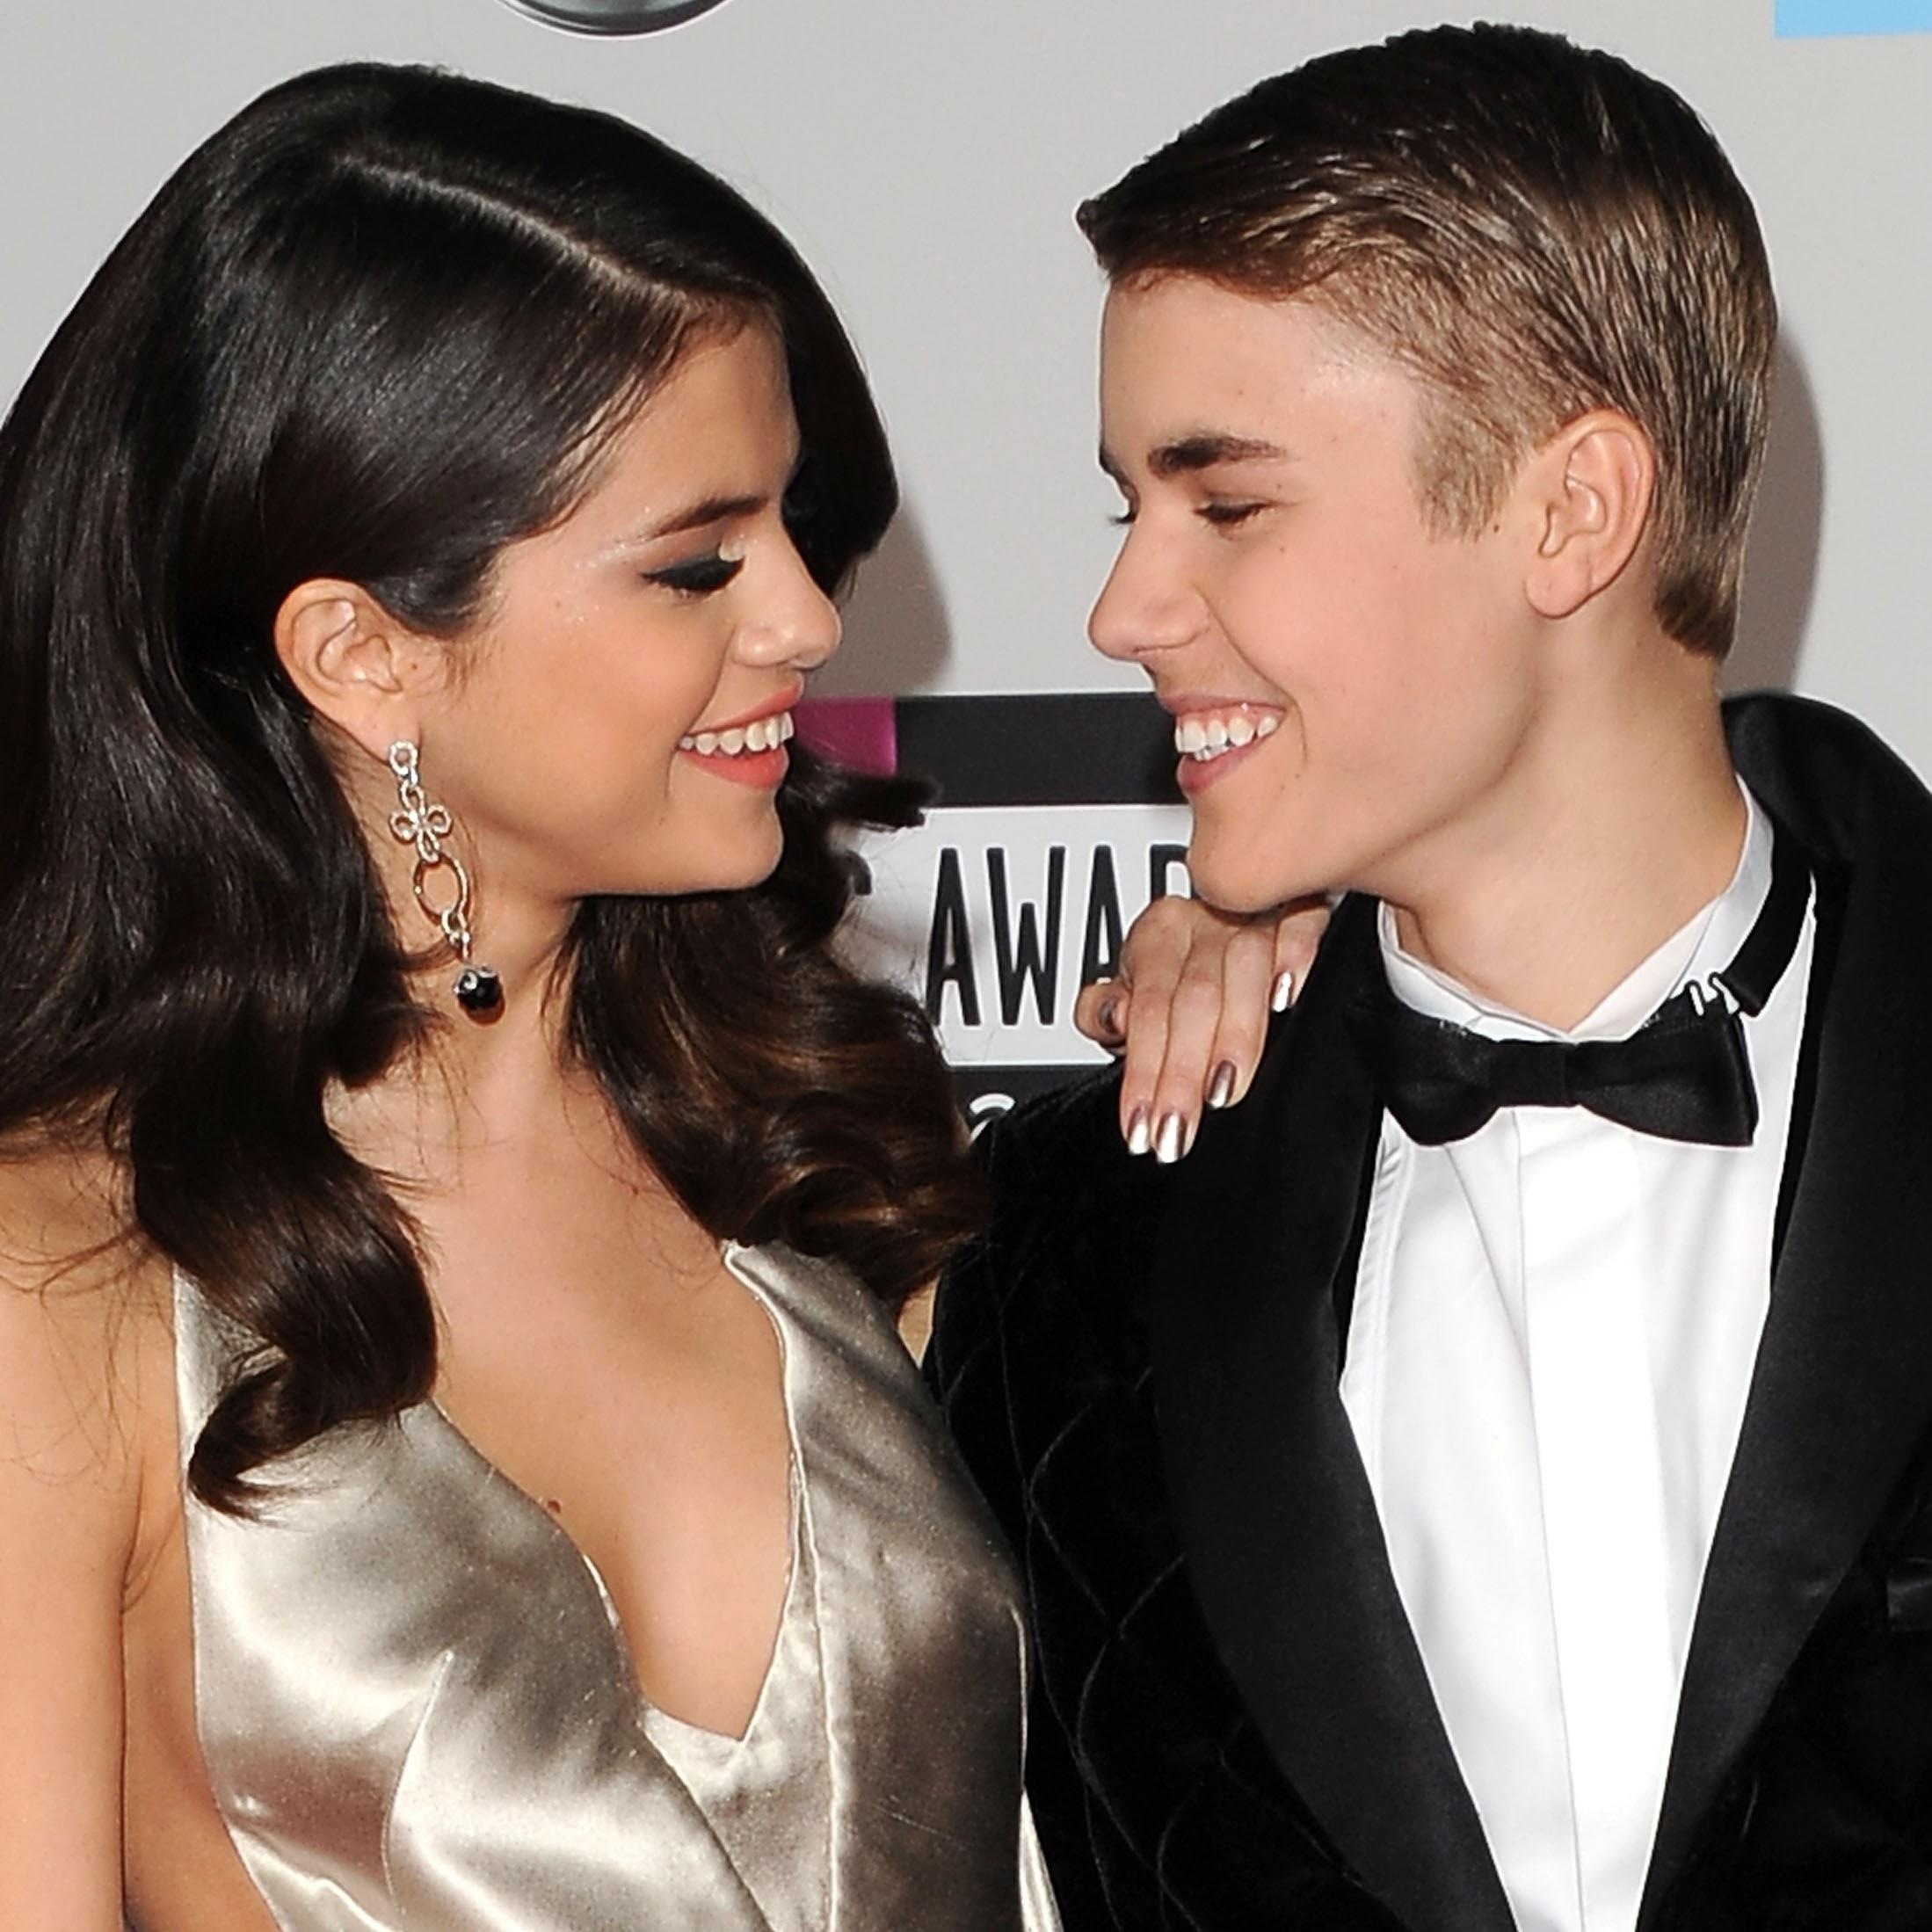 Justin Bieber and Selena Gomez Are Still Dating